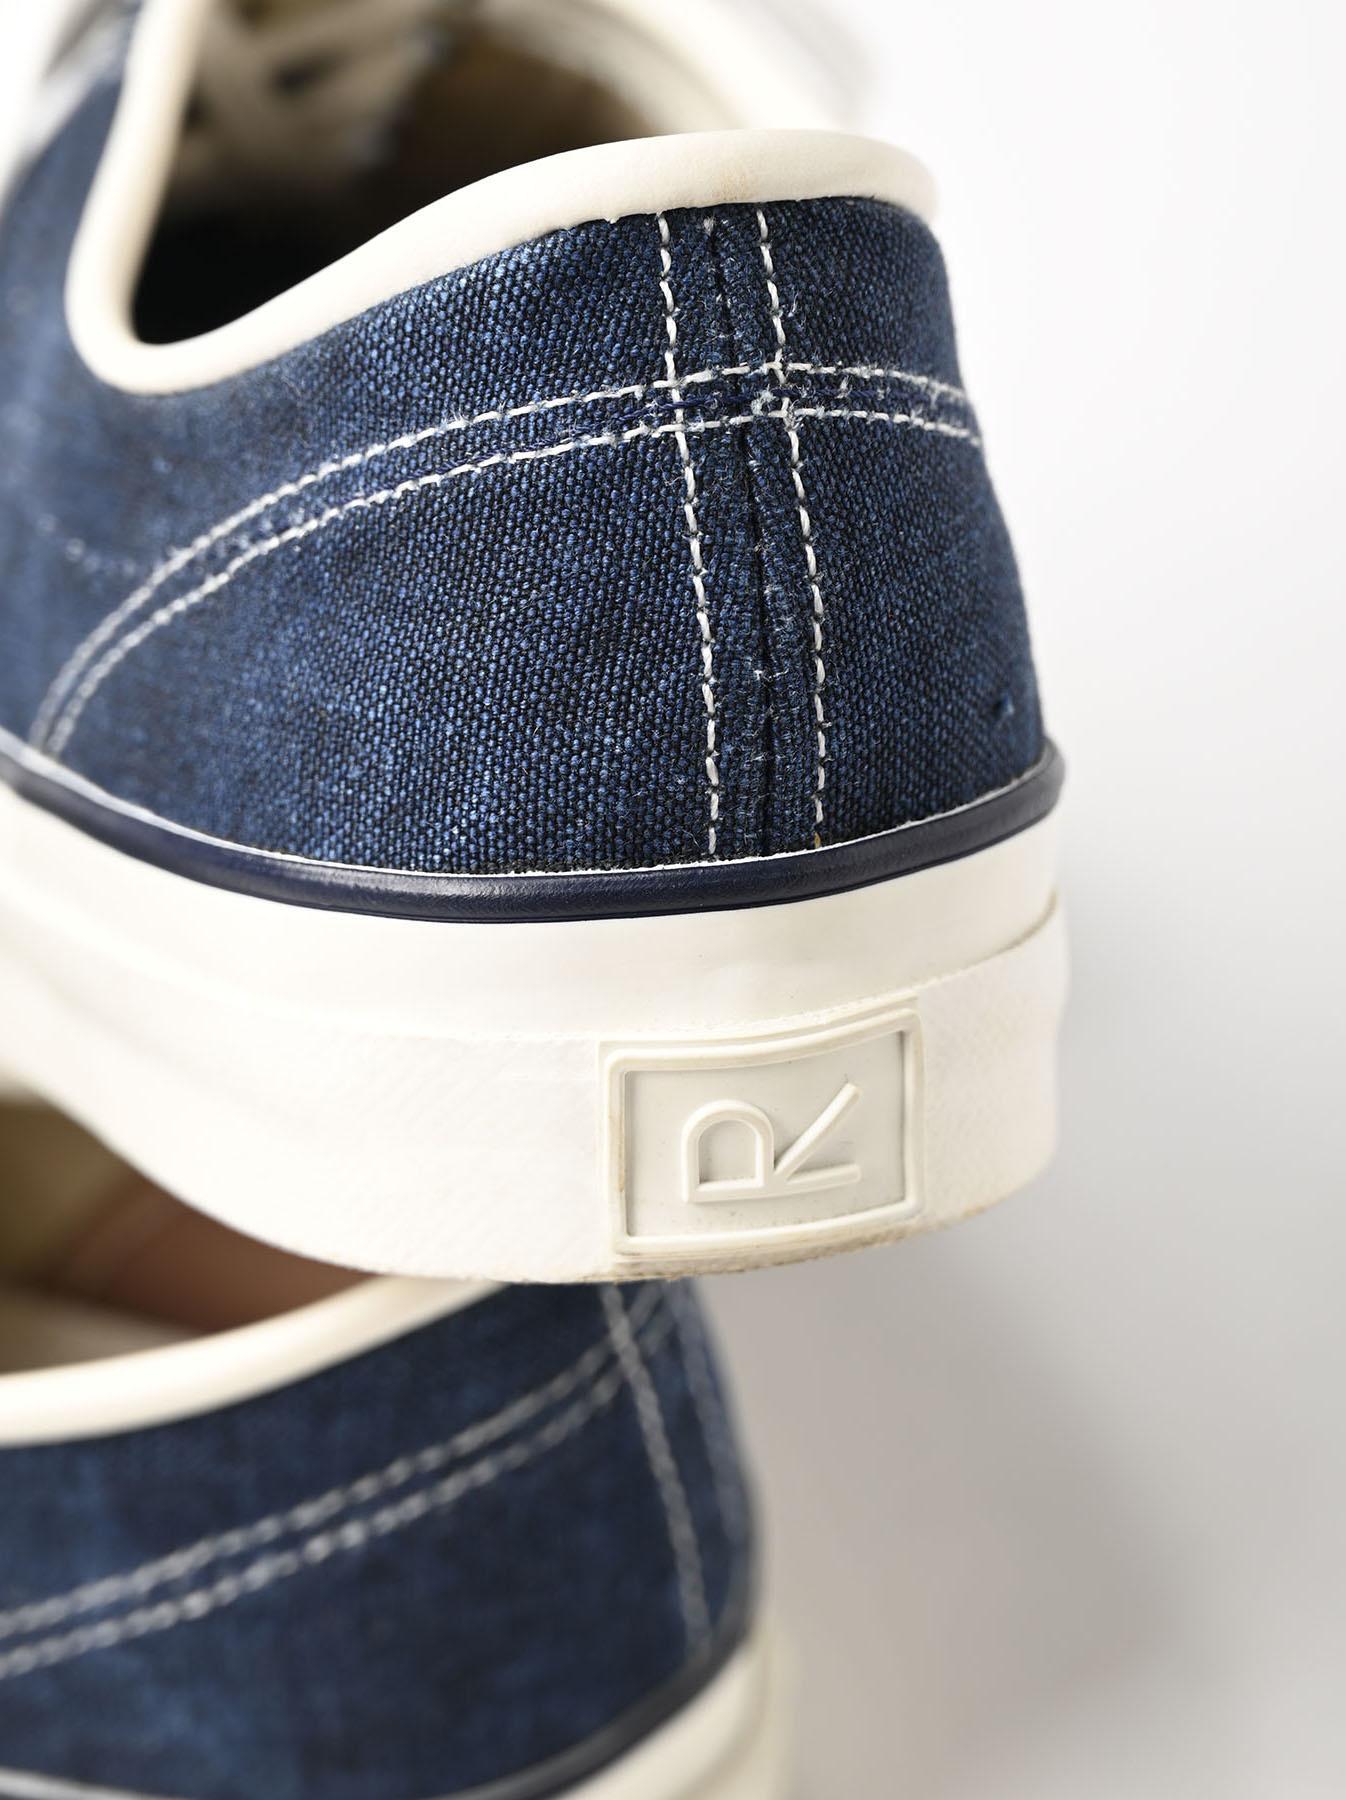 Indigo Linen Duck Sneaker size 5.5-7.5 UK-10